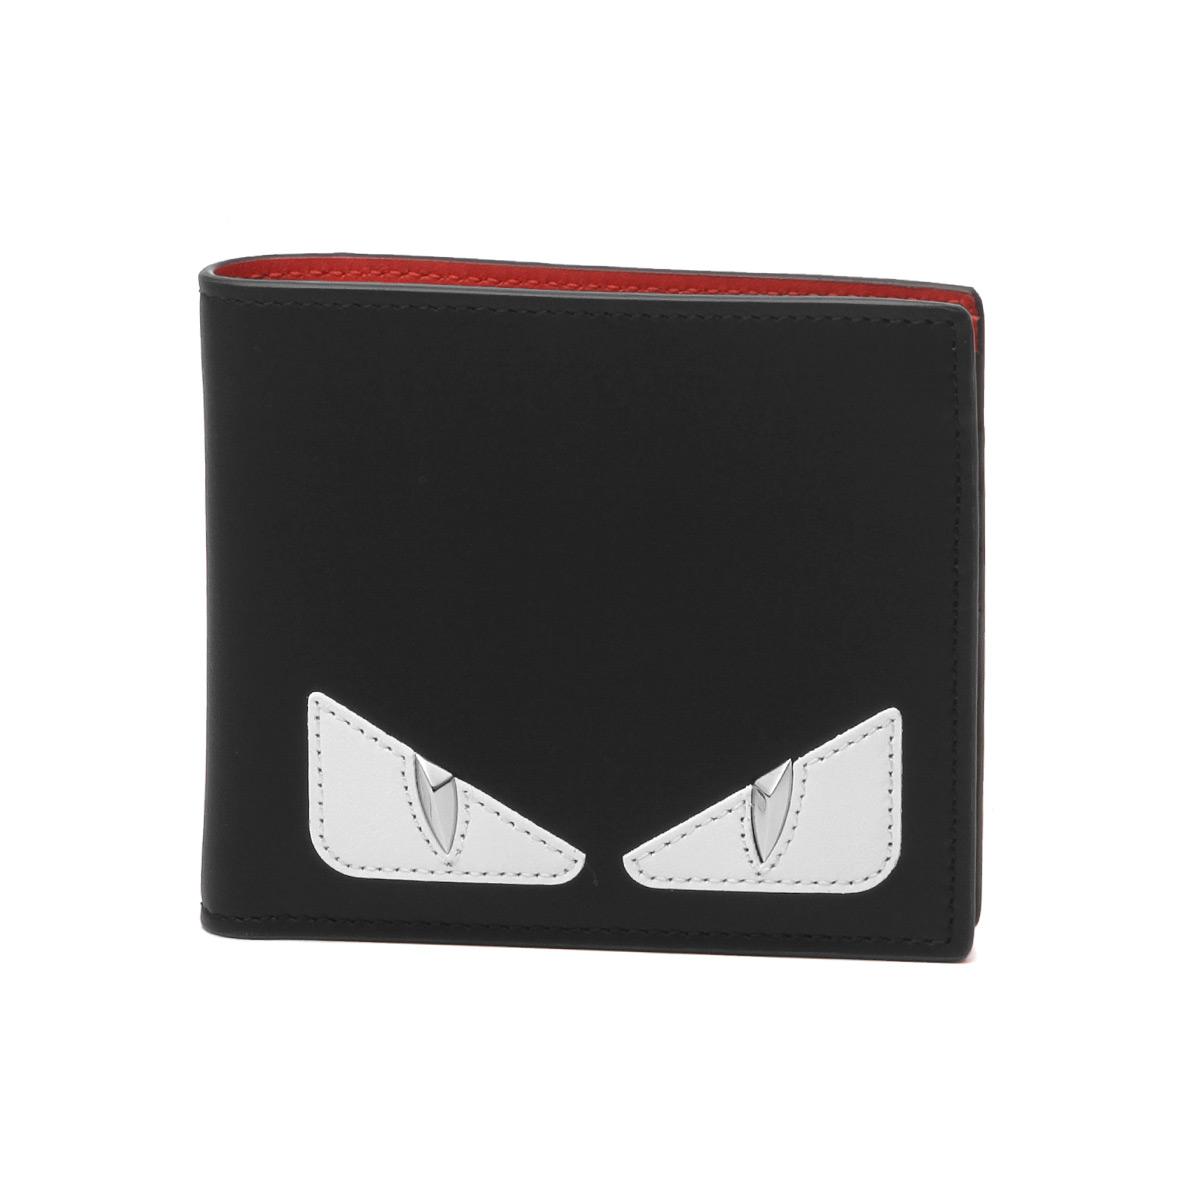 49558c6425eb フェンディFENDI財布メンズ7M0169A3DOF1387二つ折り財布BAGBUGSバッグバグズNERO+ROSSO+BCO